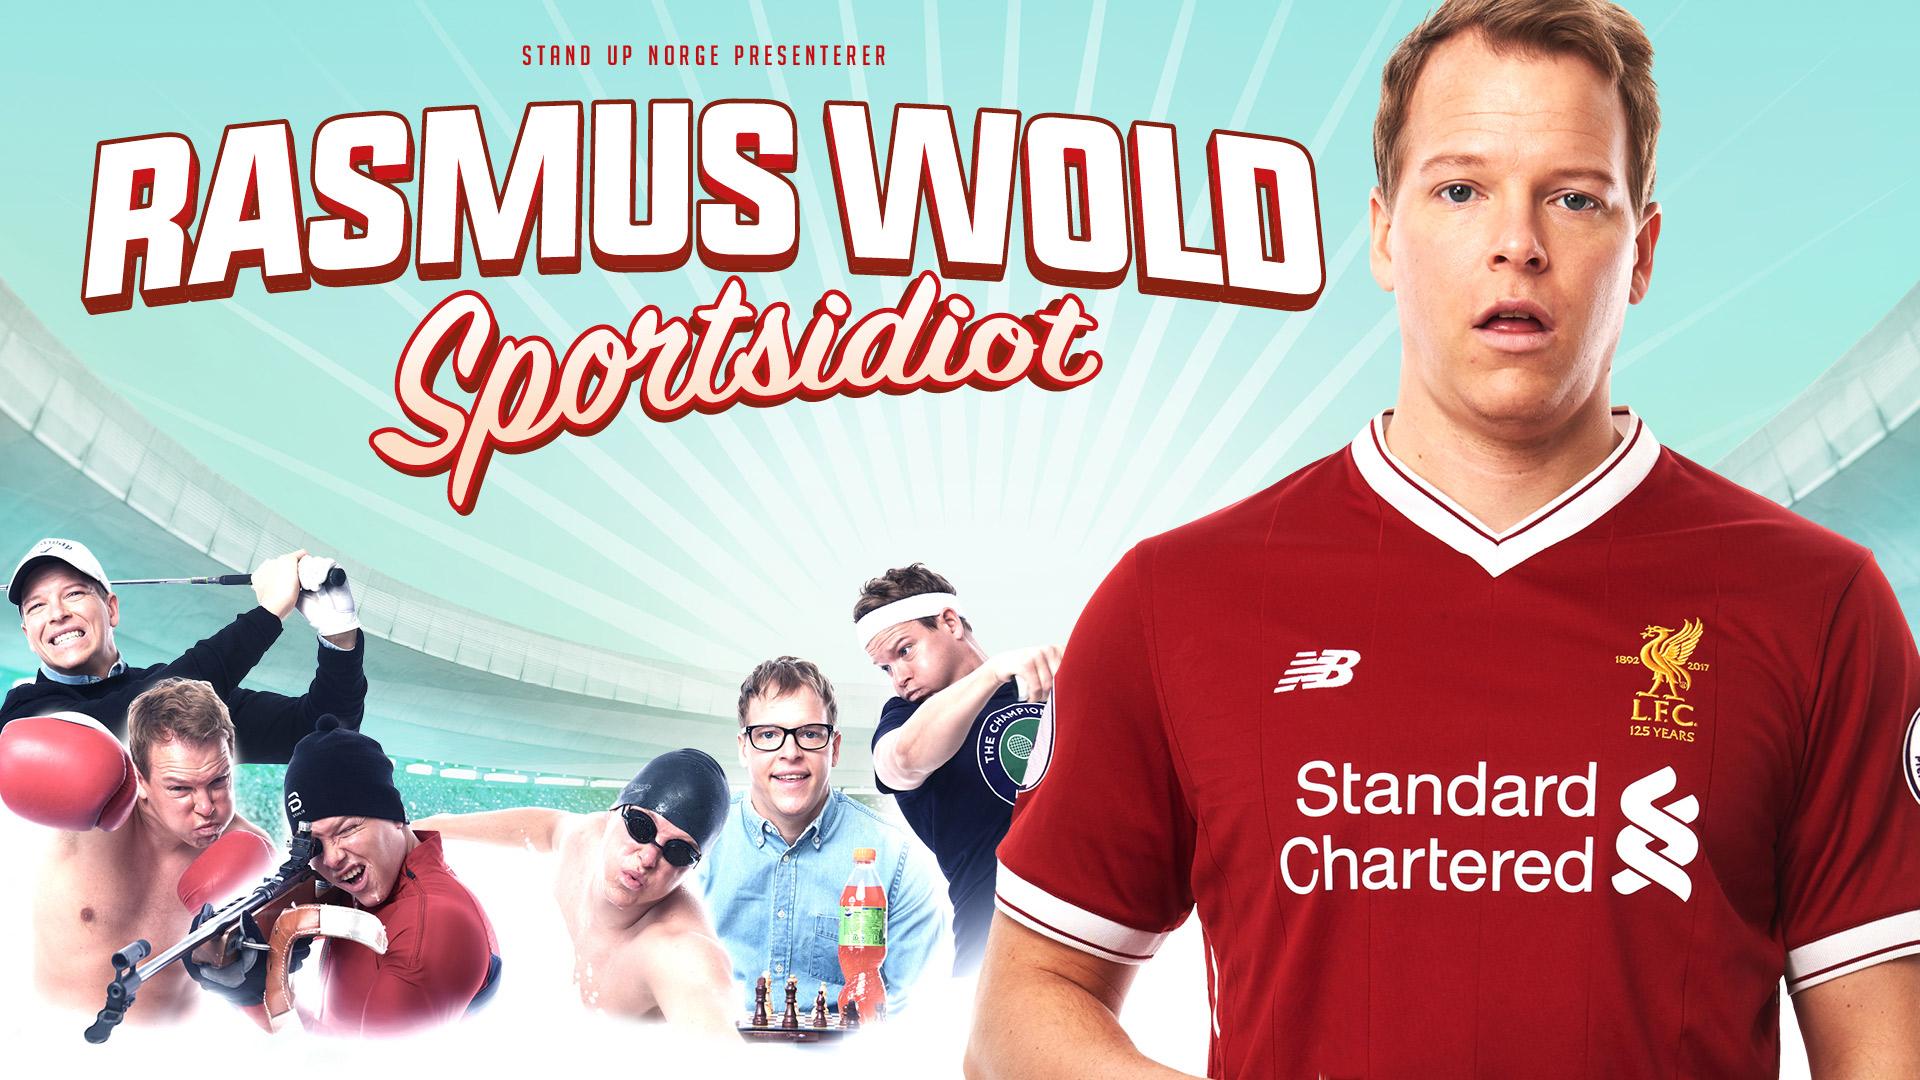 Rasmus Wold – Sportsidiot